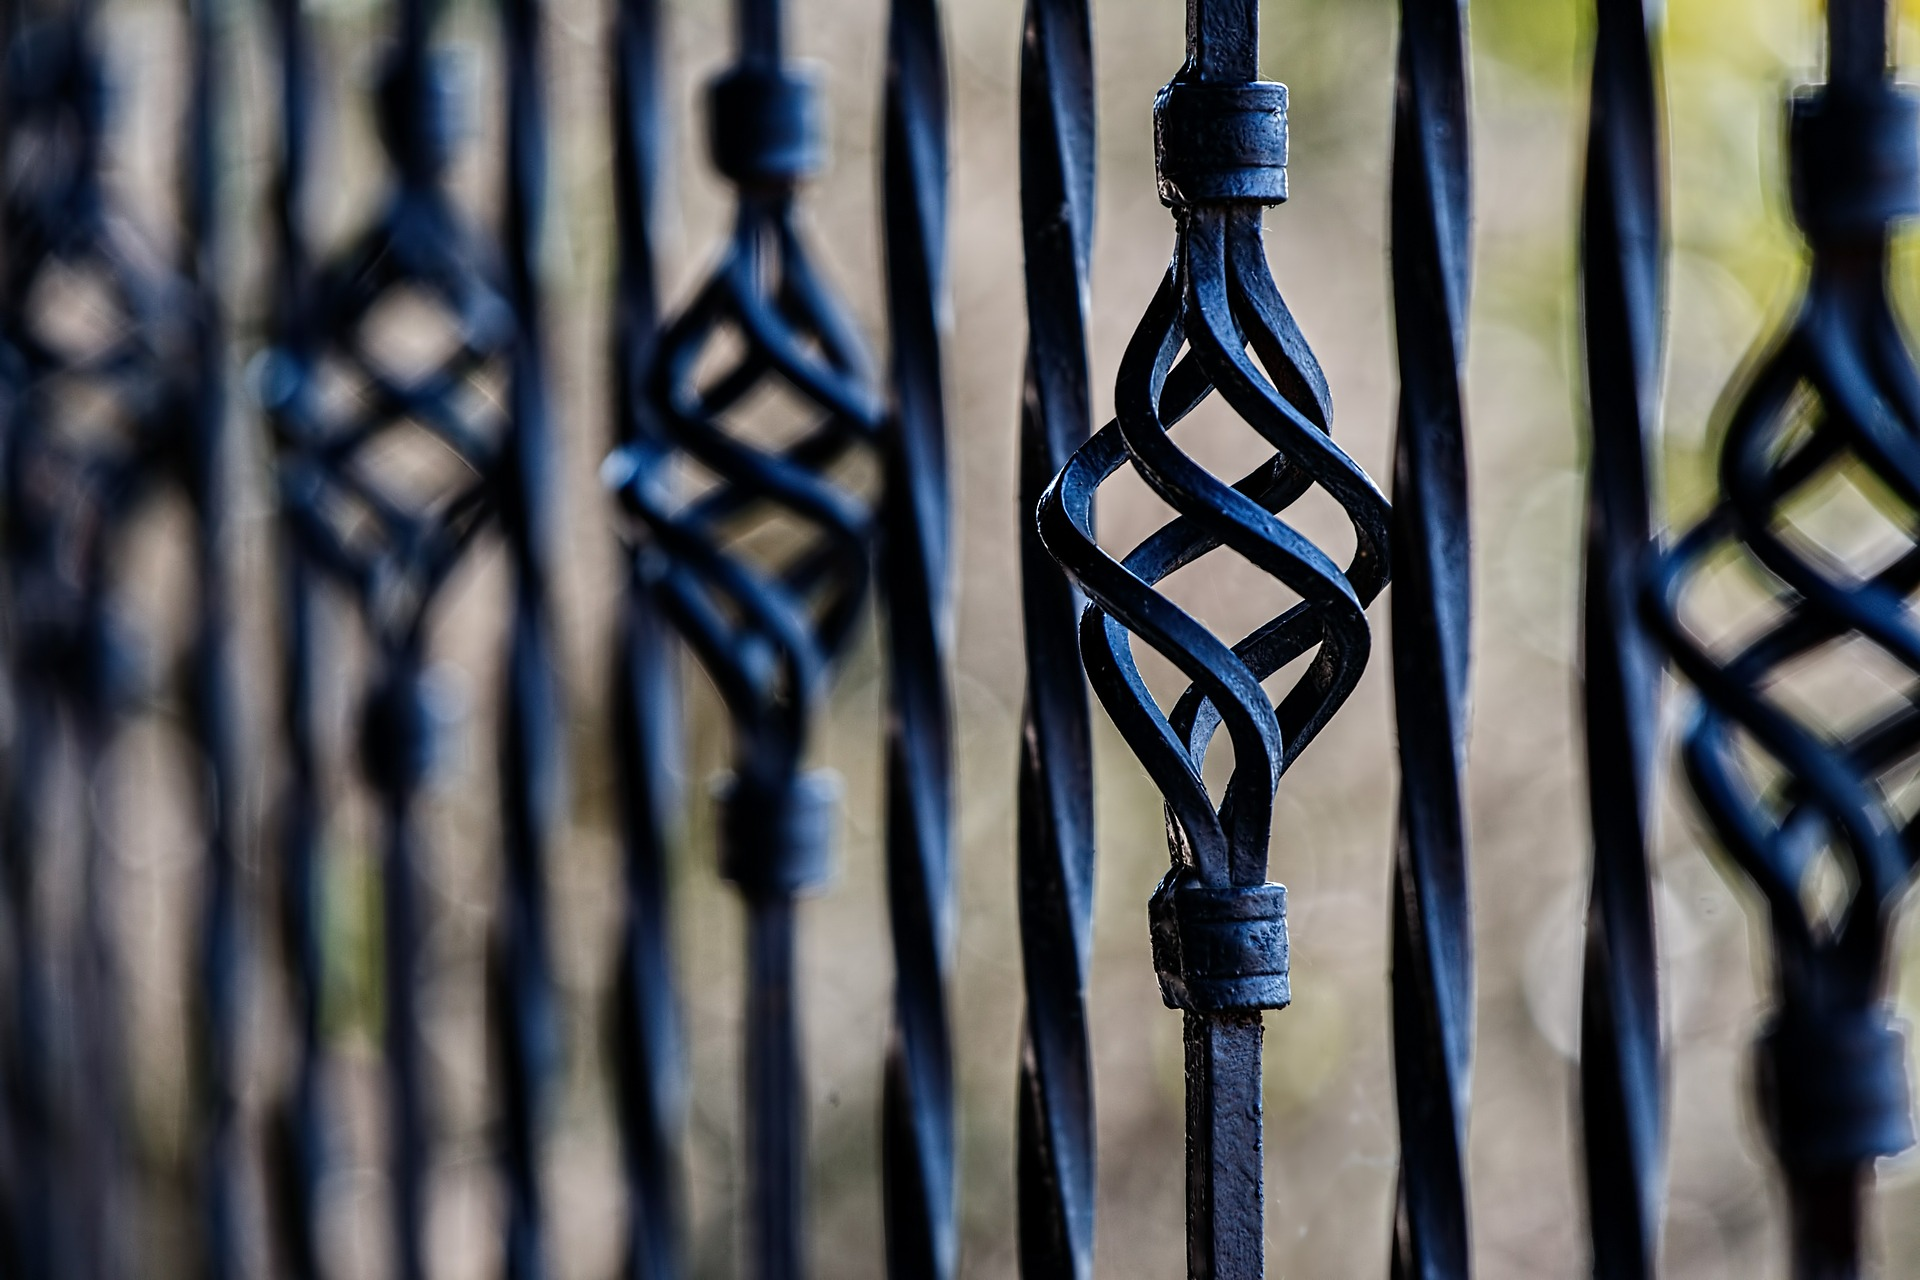 fence-450670_1920